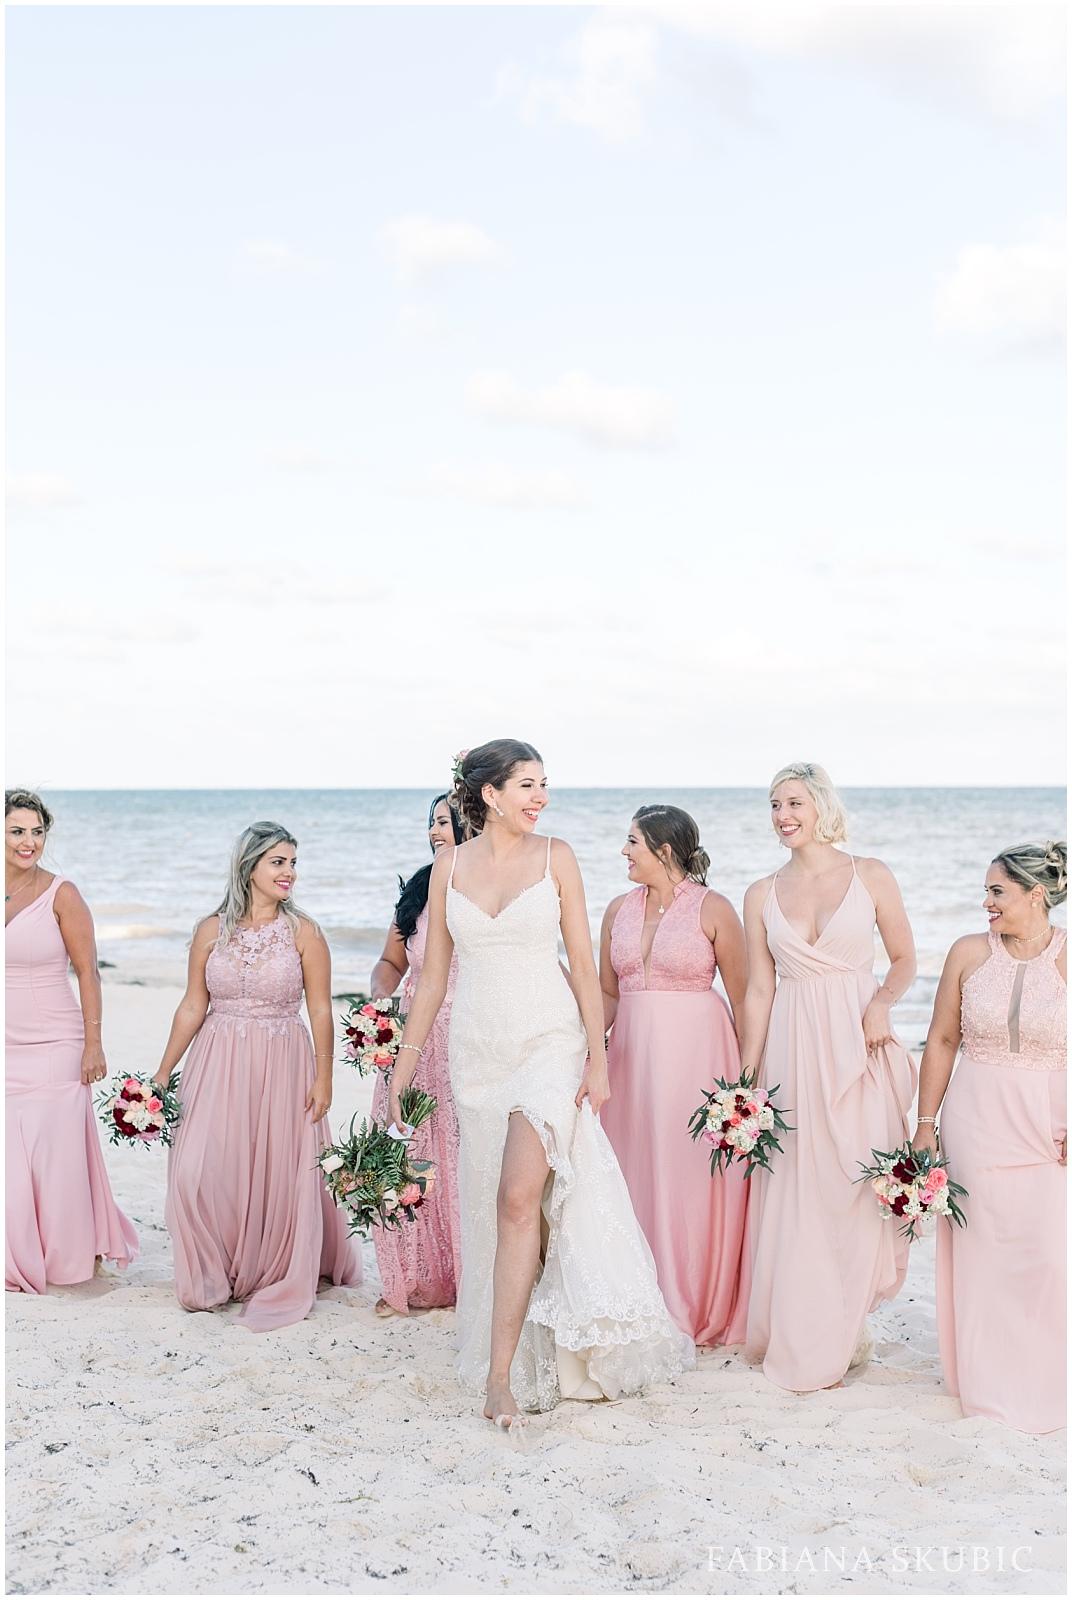 TJ_Now_Sapphire_Riviera_Cancun_Mexico_Wedding_Photos_0246.jpg